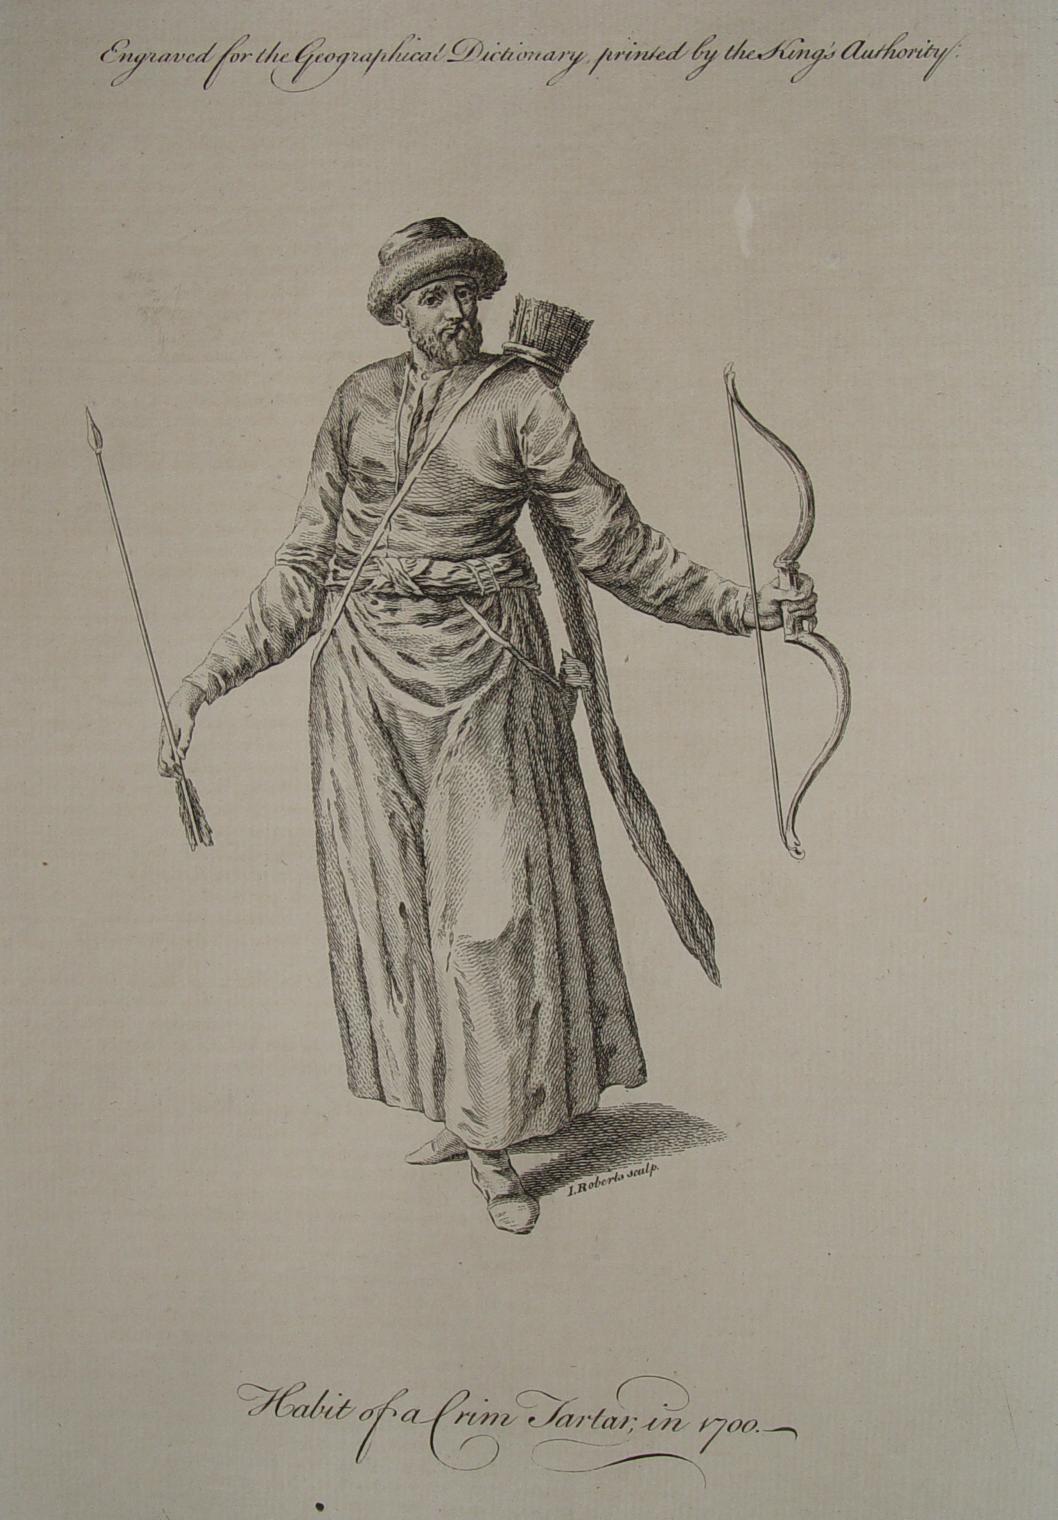 Habit of a Crim Tartar